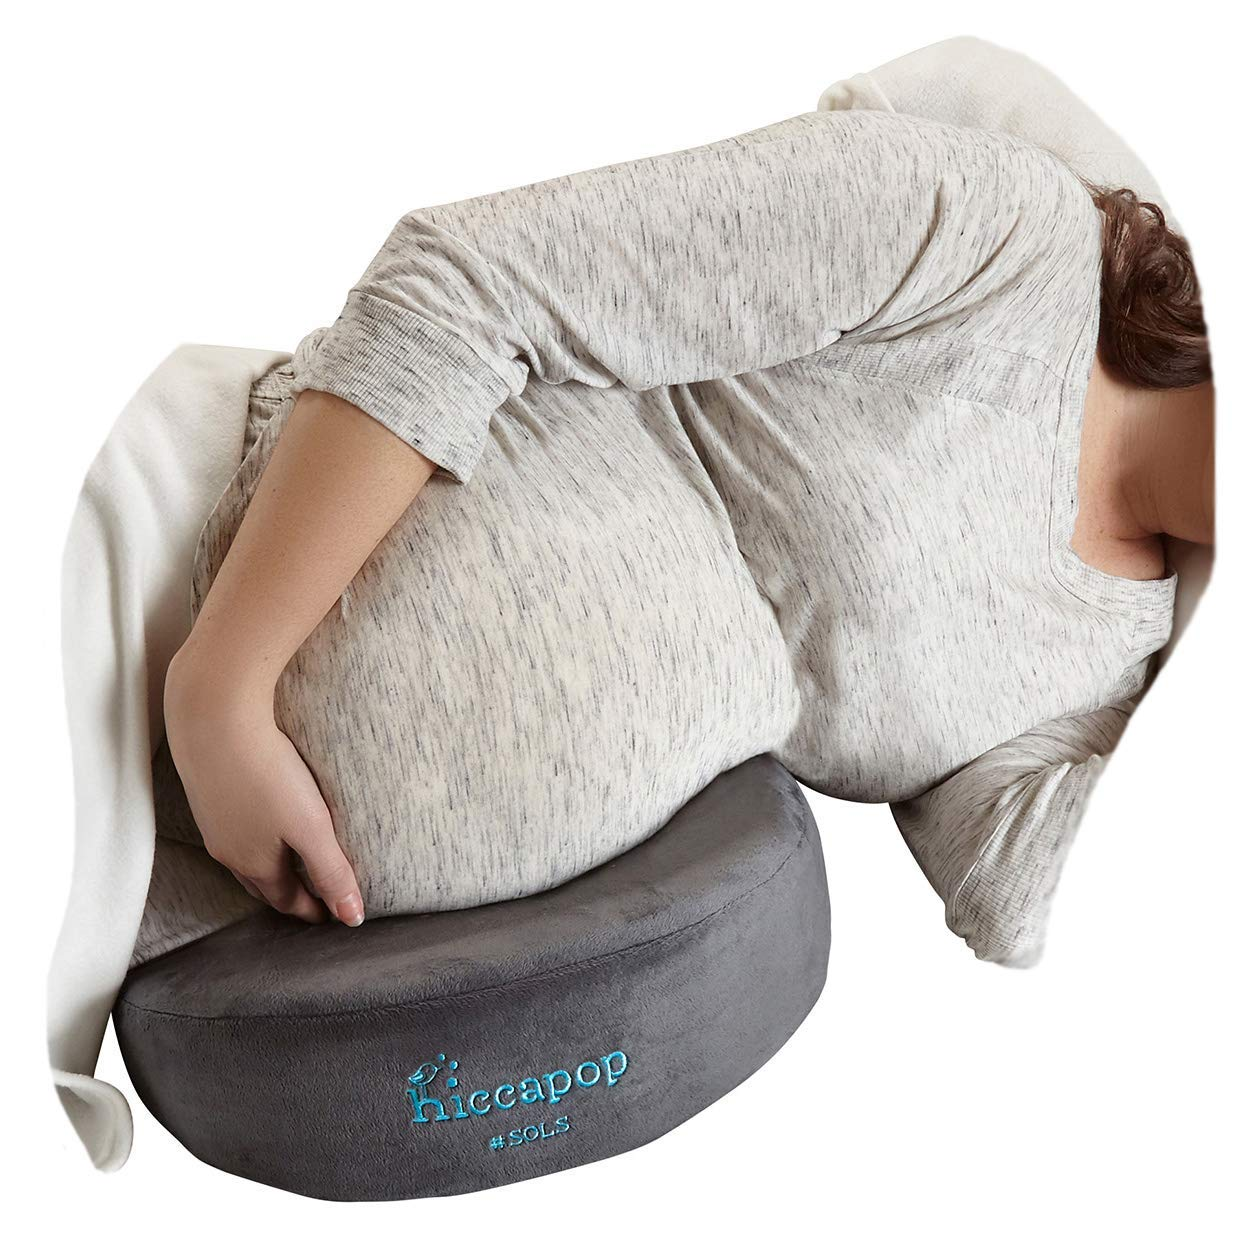 hiccapop Best Pregnancy Pillow